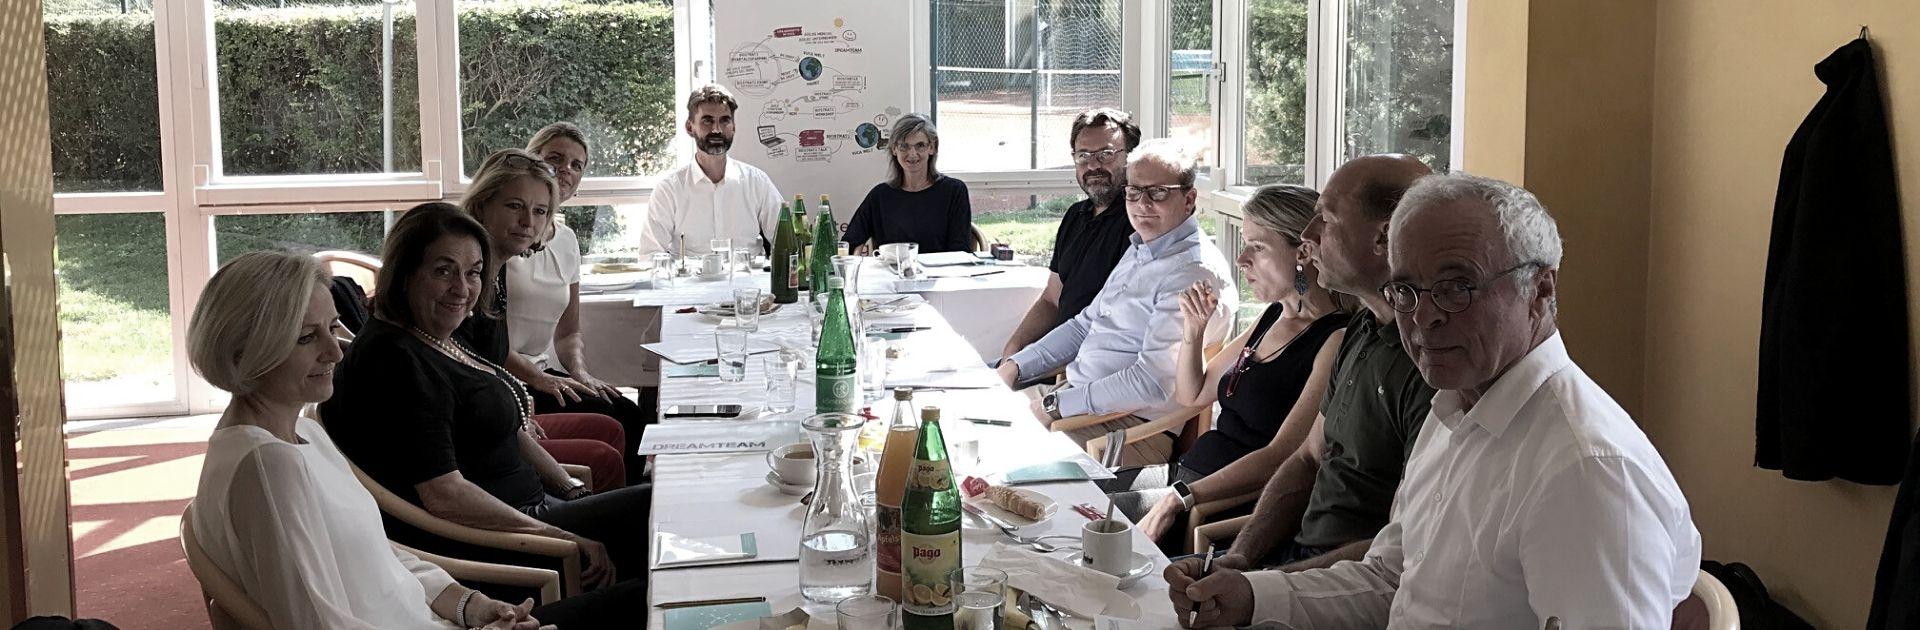 DreamTeam - Energy Talk